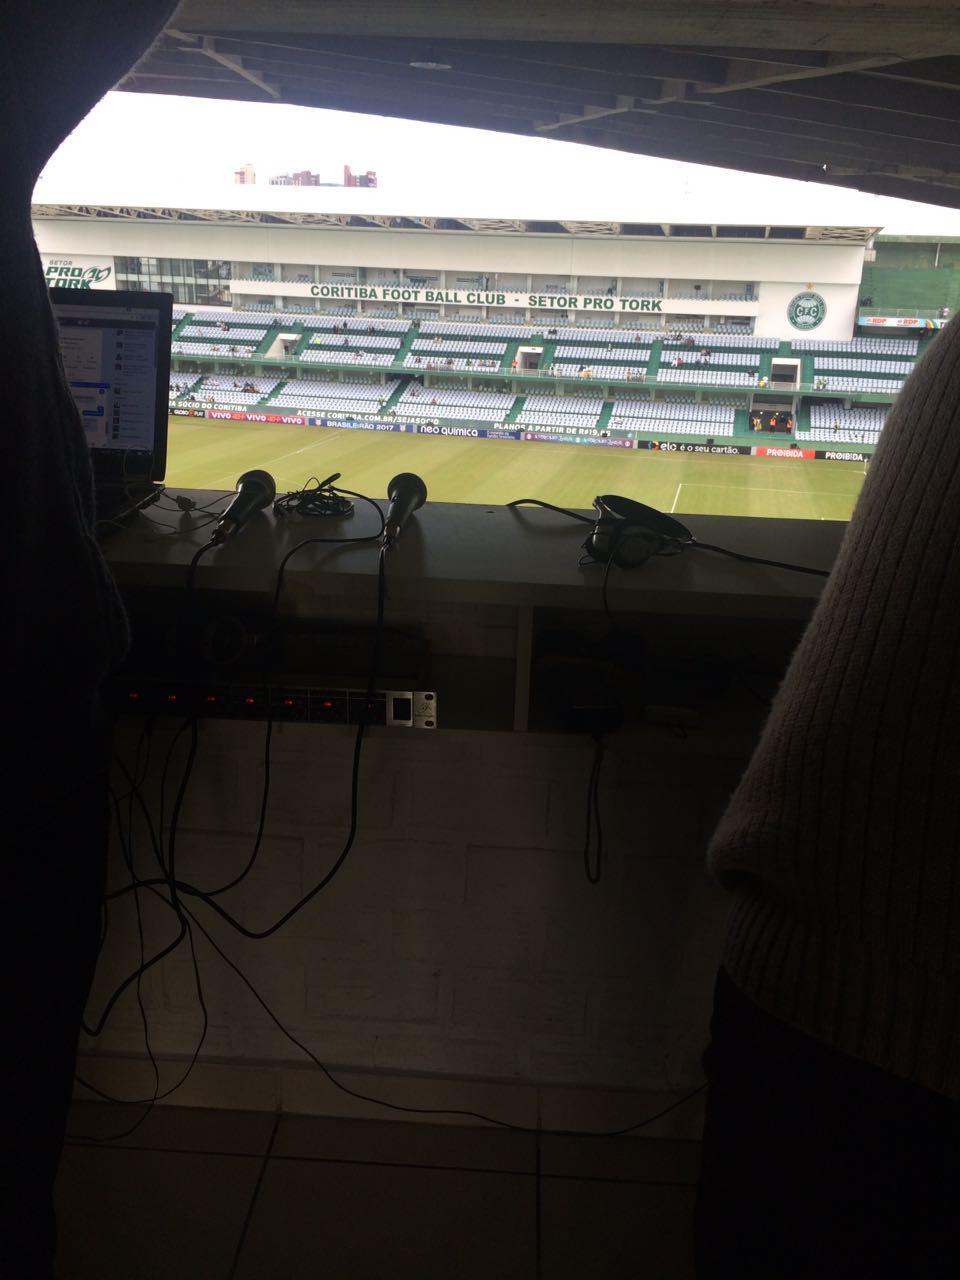 Cabine da Rádio WEBCOMBRASIL no Estádio Antonio Couto Pereira